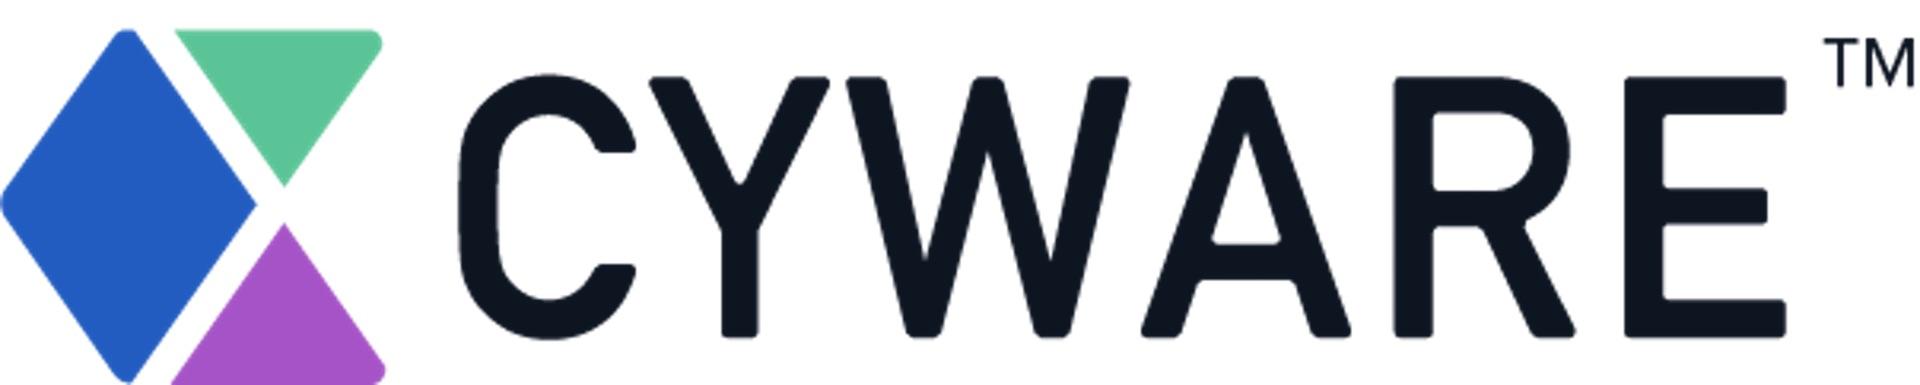 Cyware_Black_Logo@3x